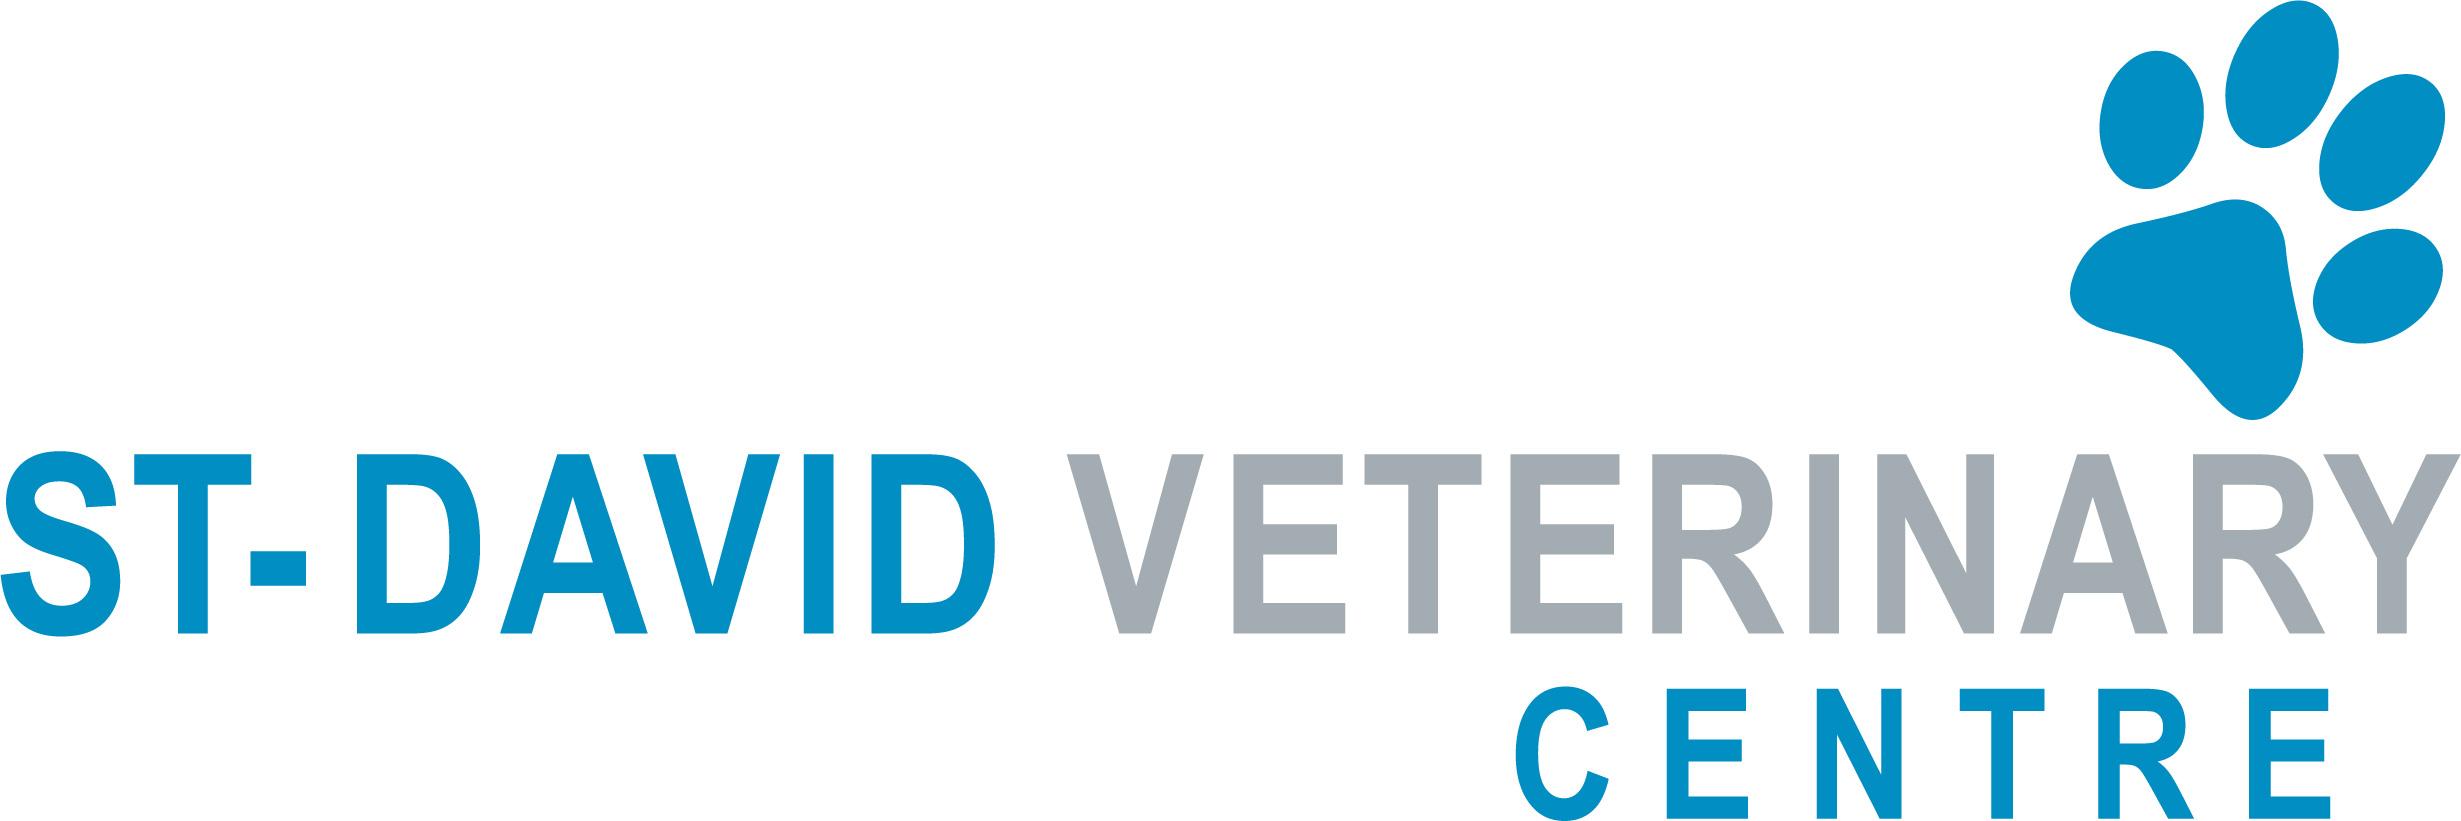 St. David Veterinary Centre, Llanishen - Cardiff, South Glamorgan CF14 5DR - 02921 671231 | ShowMeLocal.com